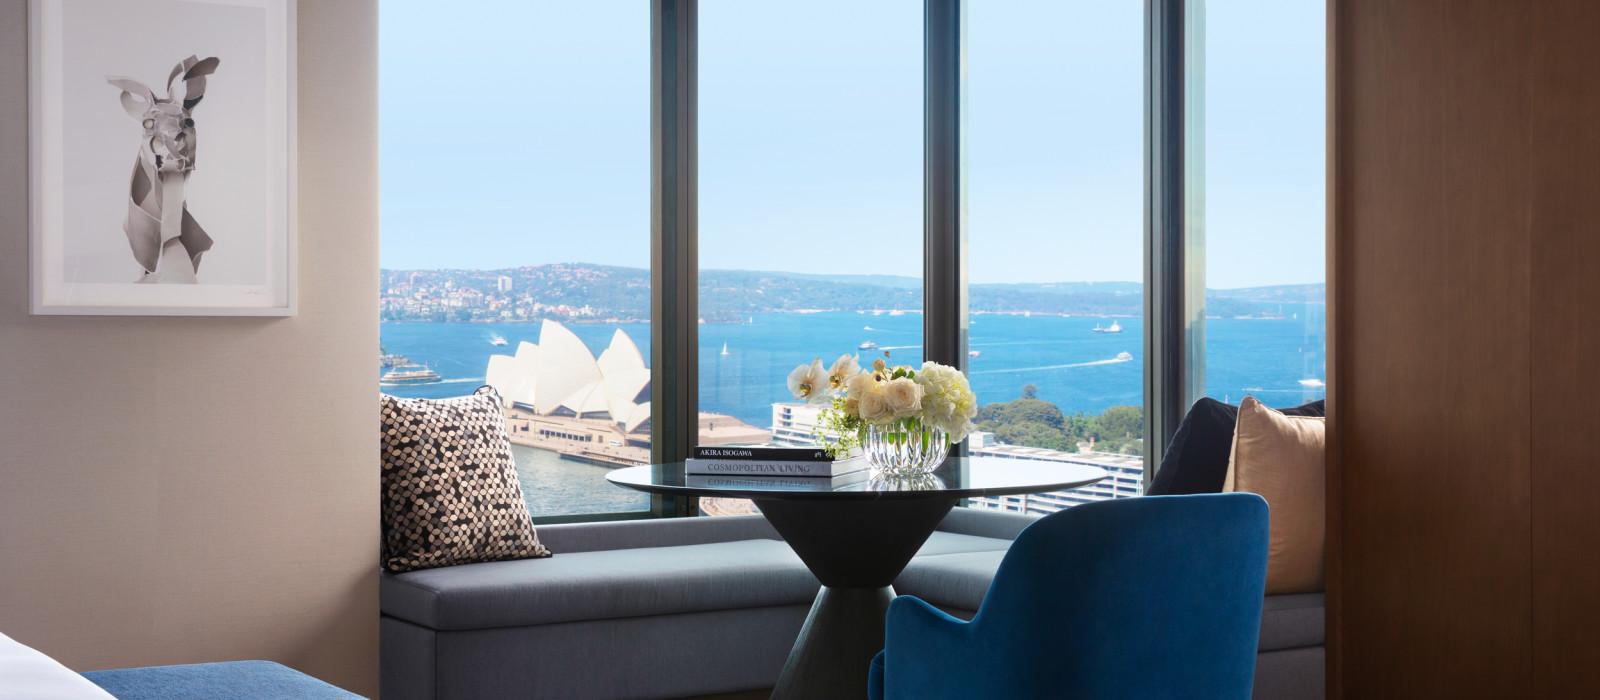 The Four Seasons Sydney Hotel In Australia Enchanting Travels